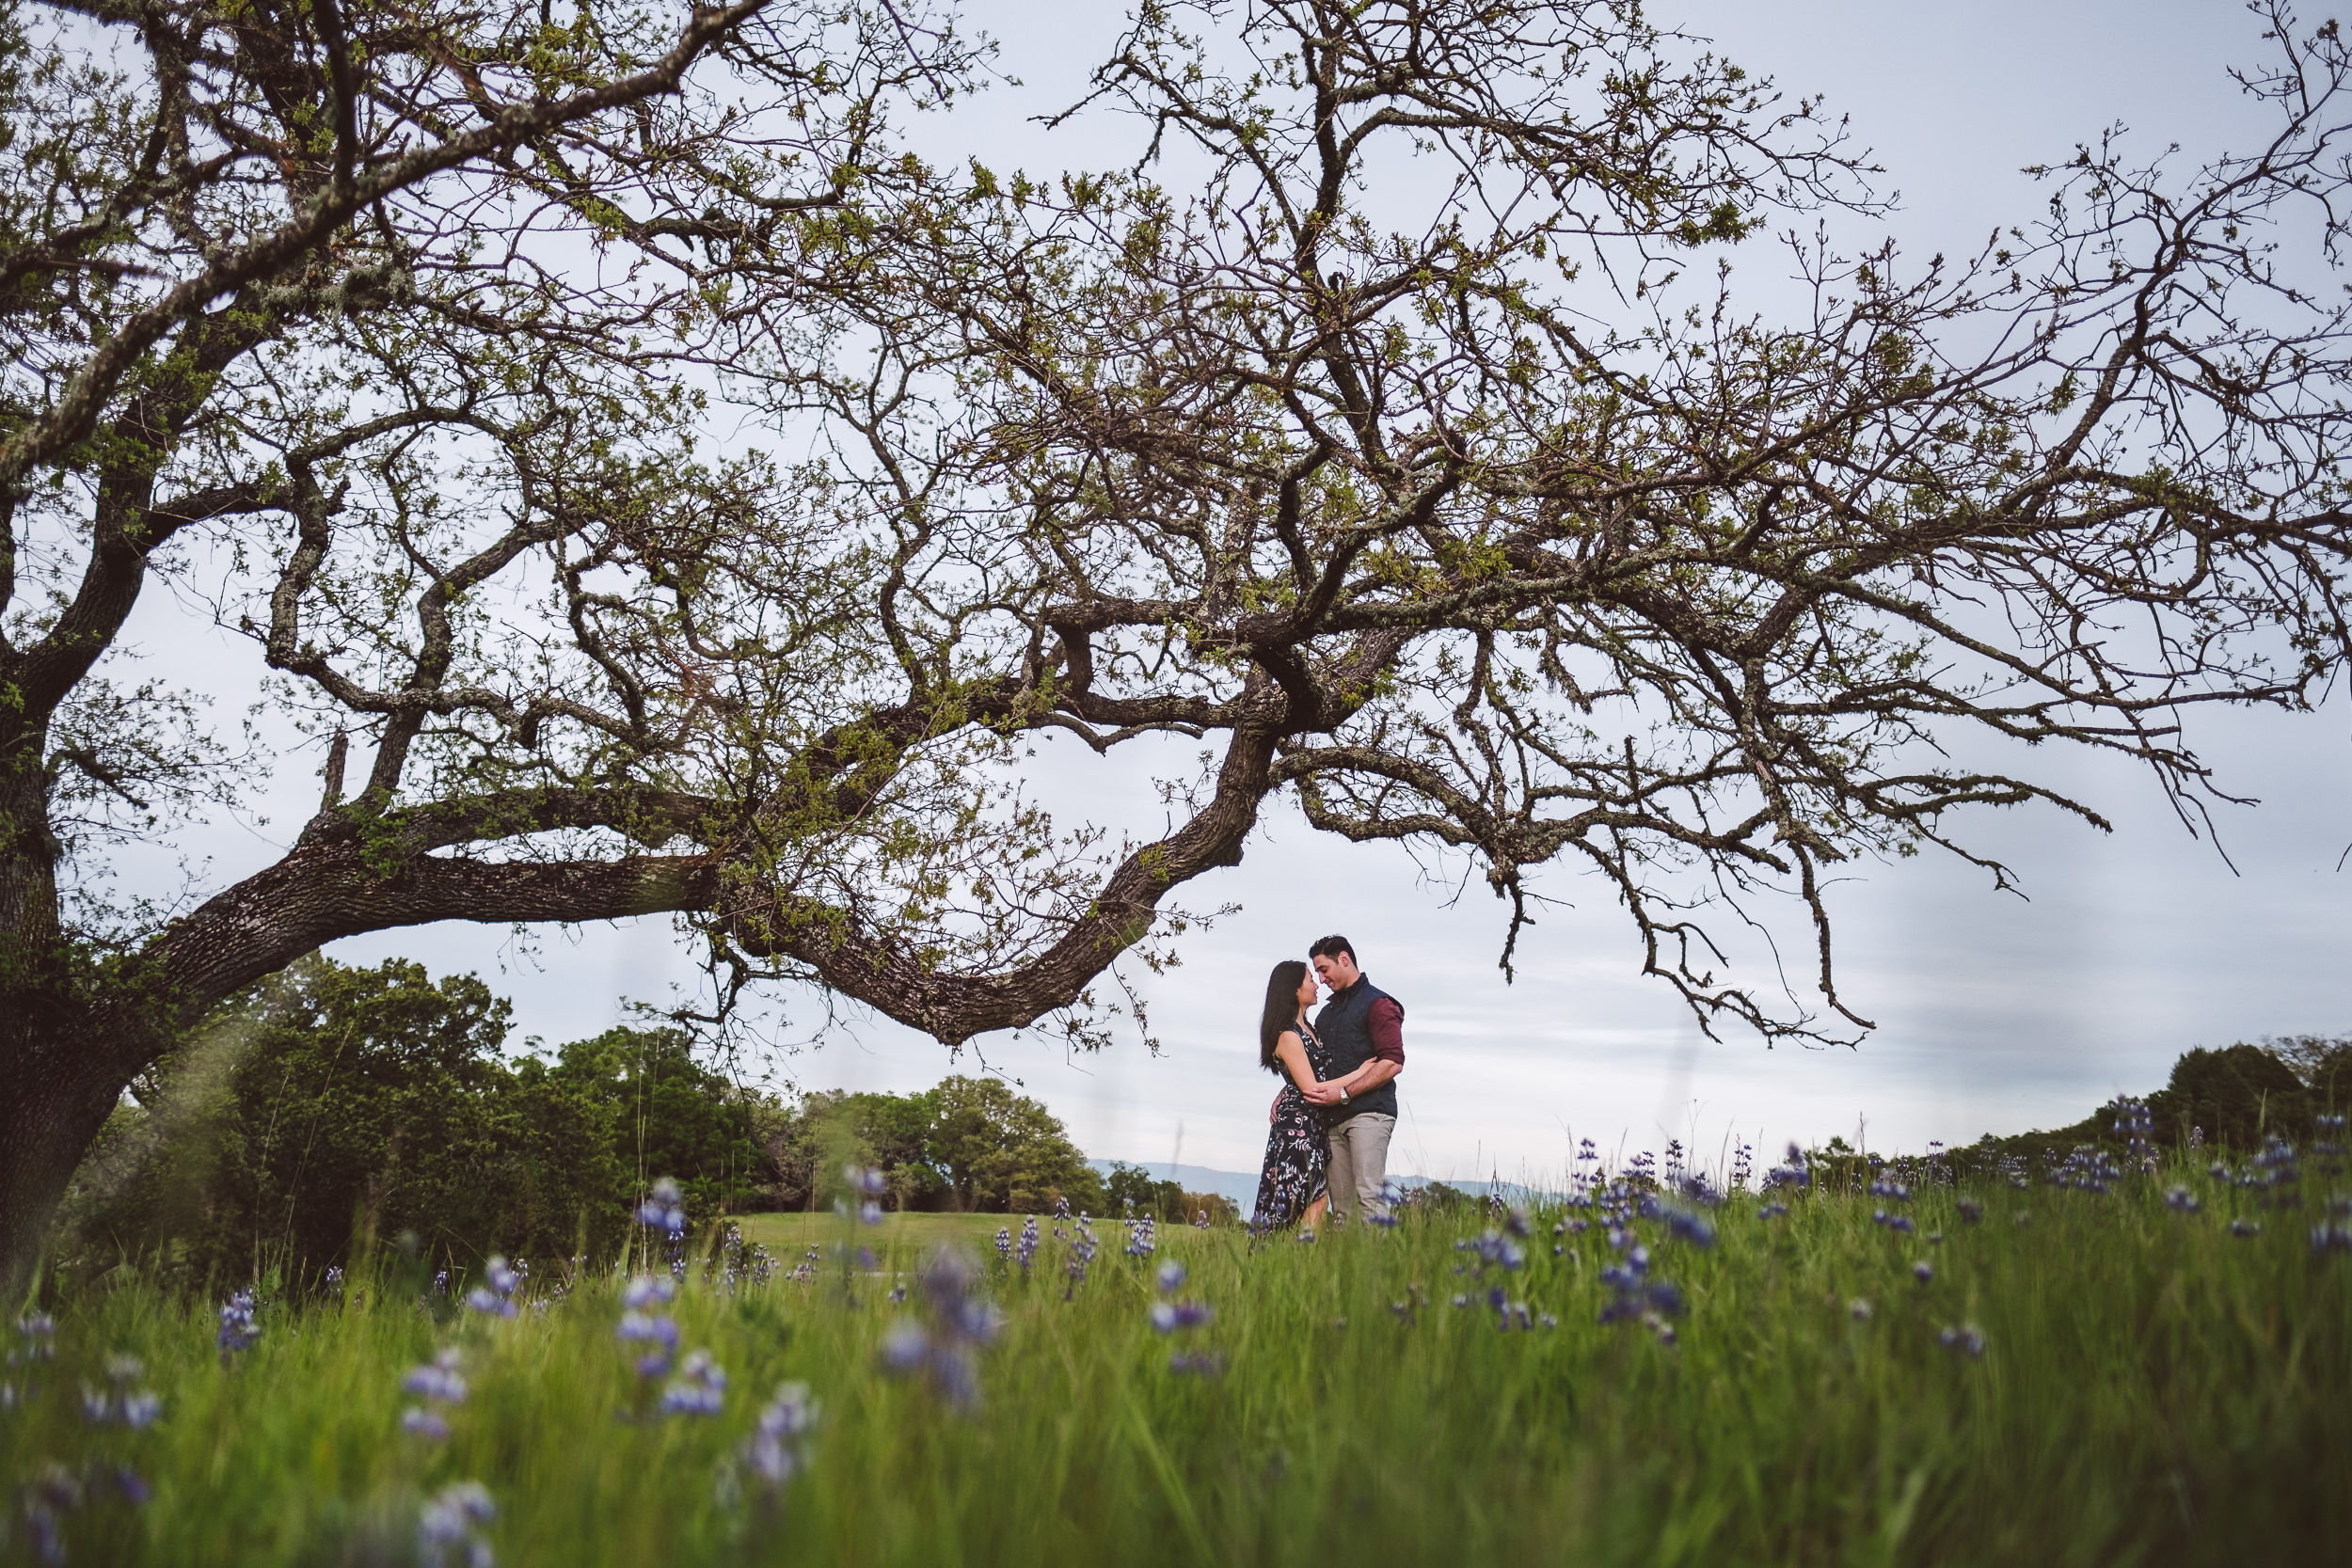 Palo-Alto-Foothills-Park-Engagement-Photography-023.jpg